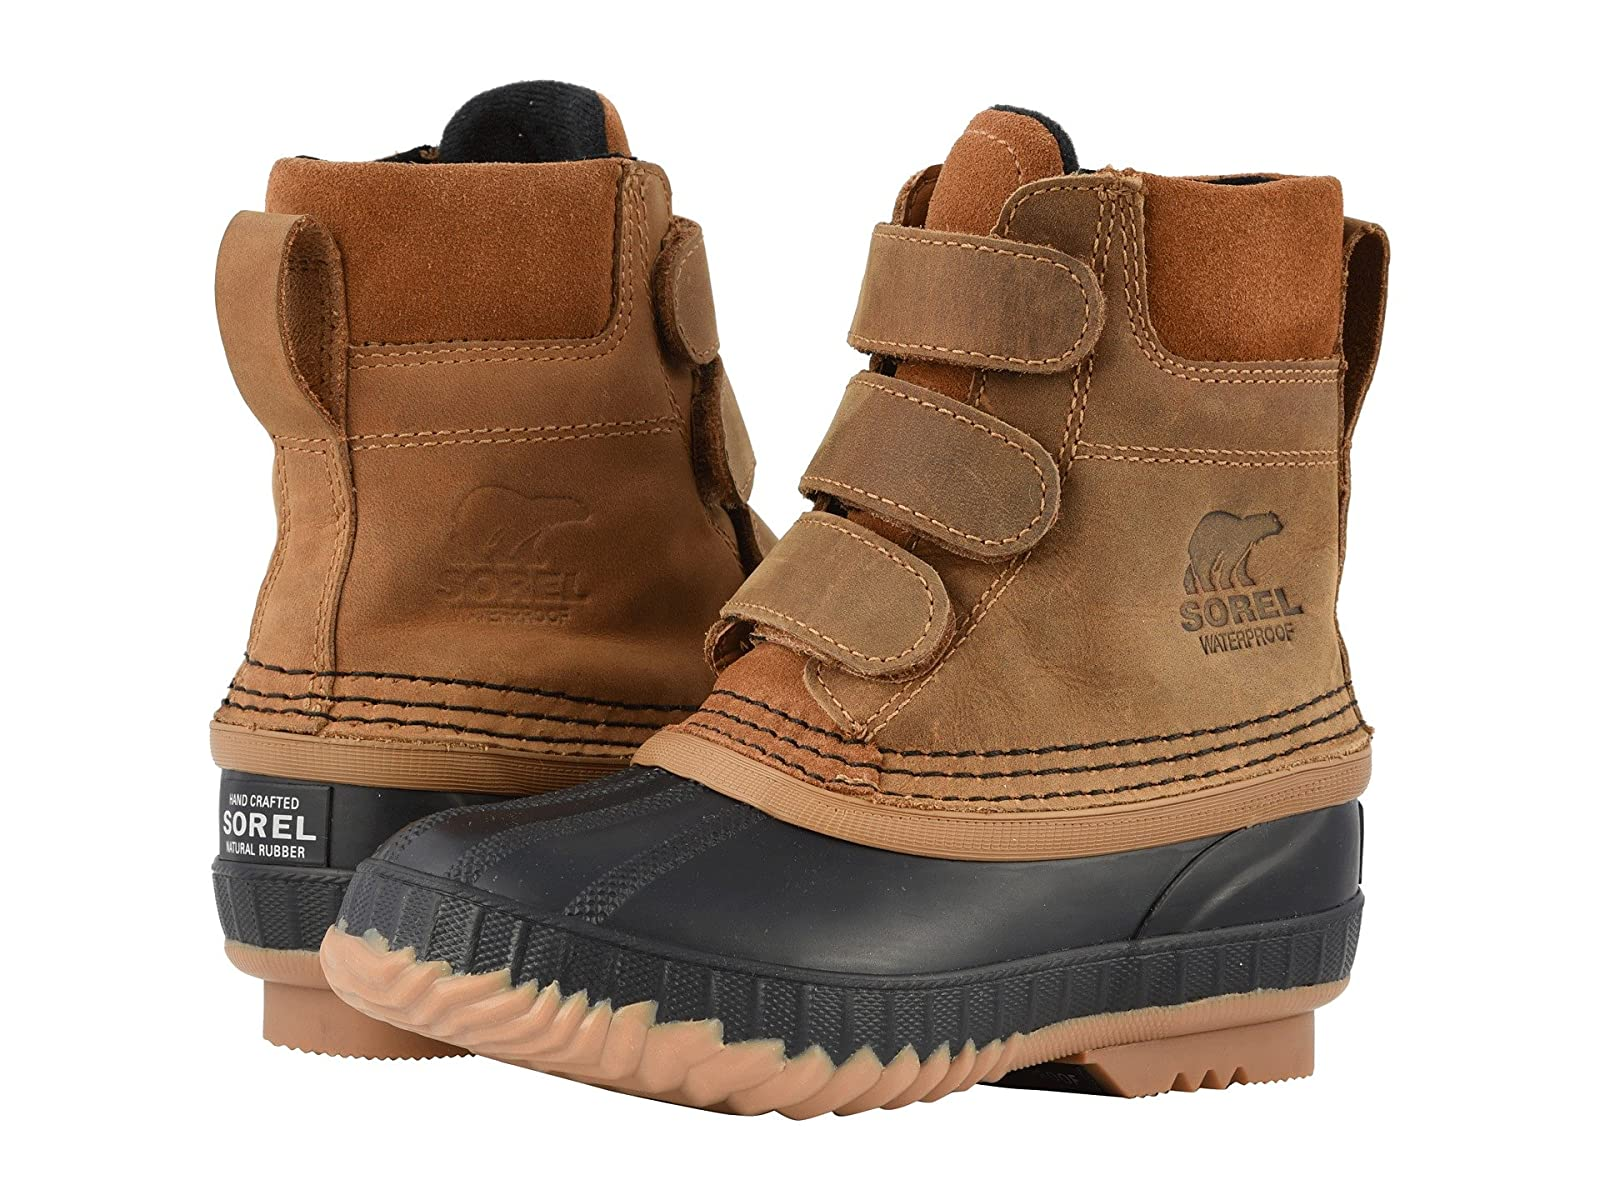 SOREL Kids Cheyanne™ II Strap (Little Kid/Big Kid)Economical and quality shoes